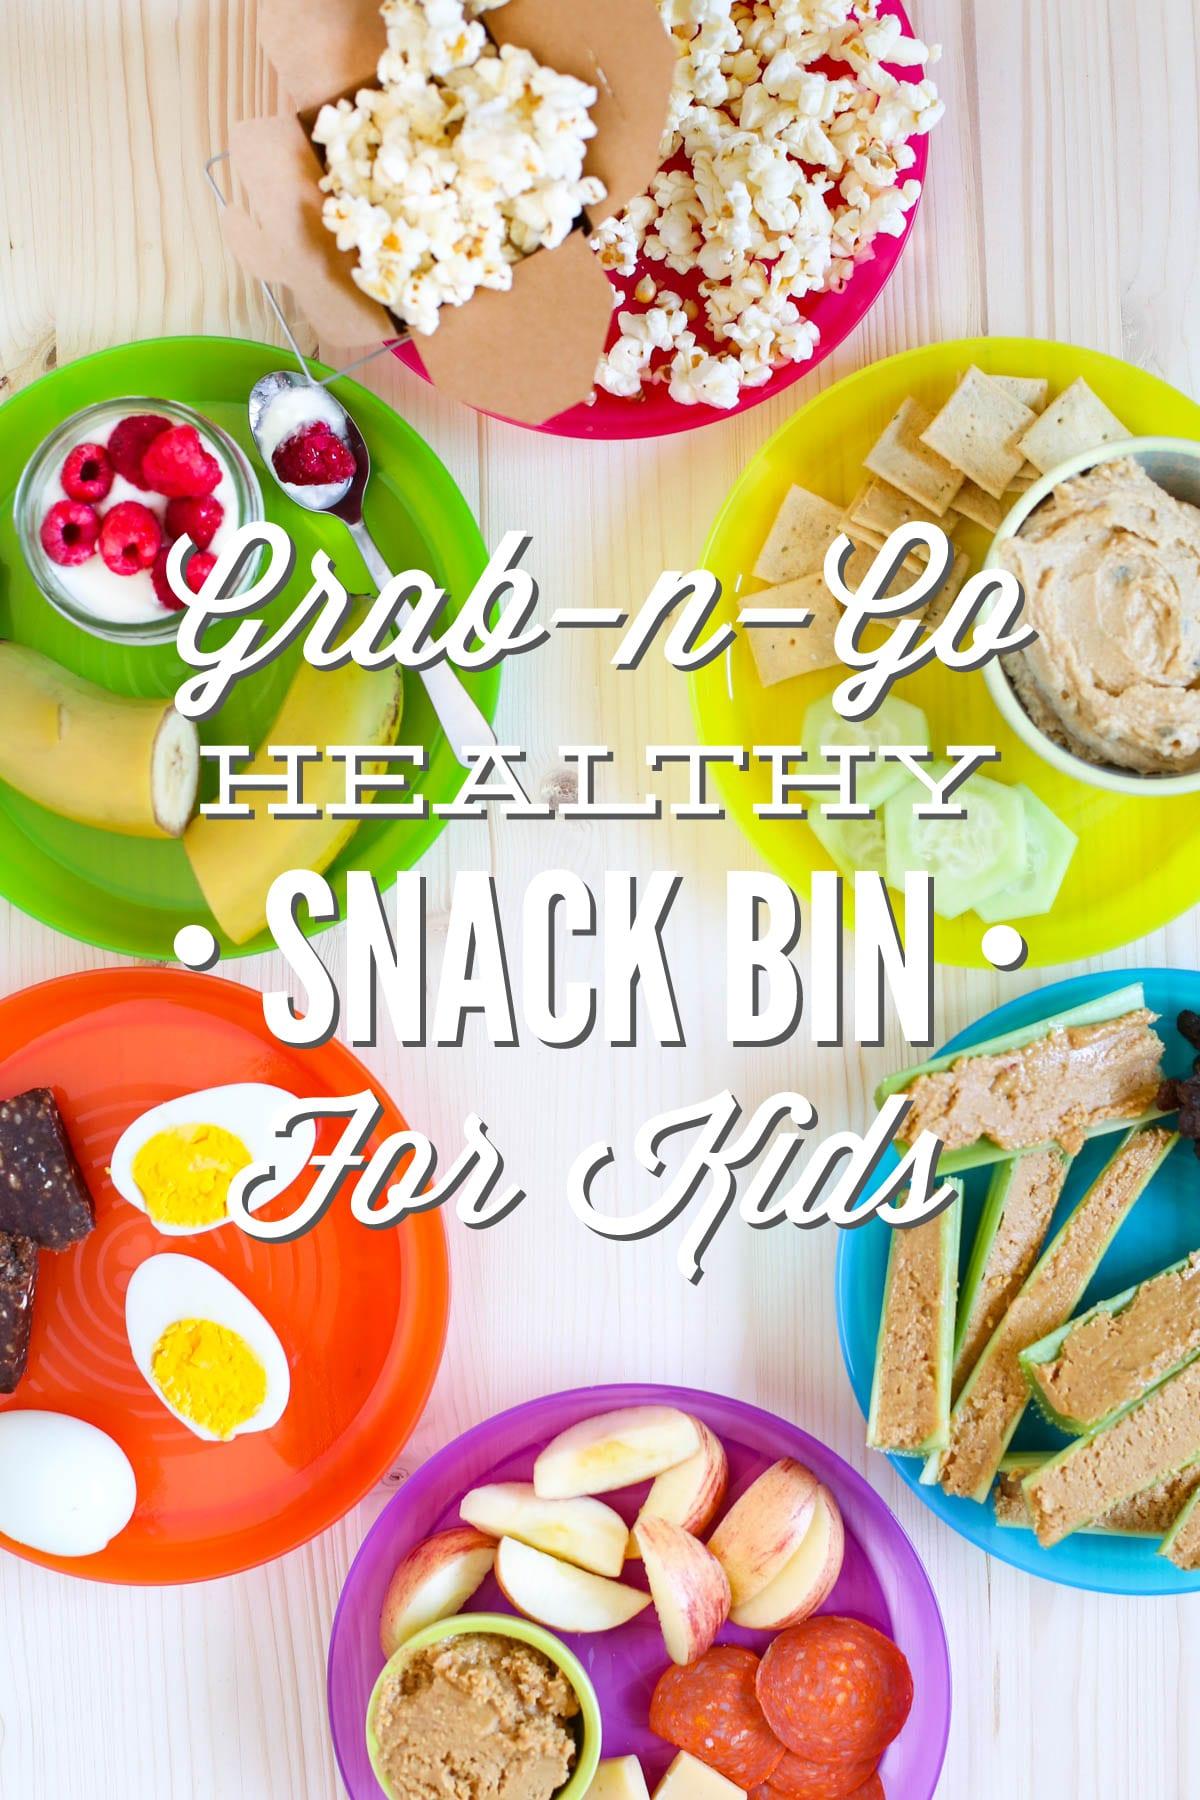 Simplify Snack-Time + Grab-n-Go Healthy Snack Bin For Kids